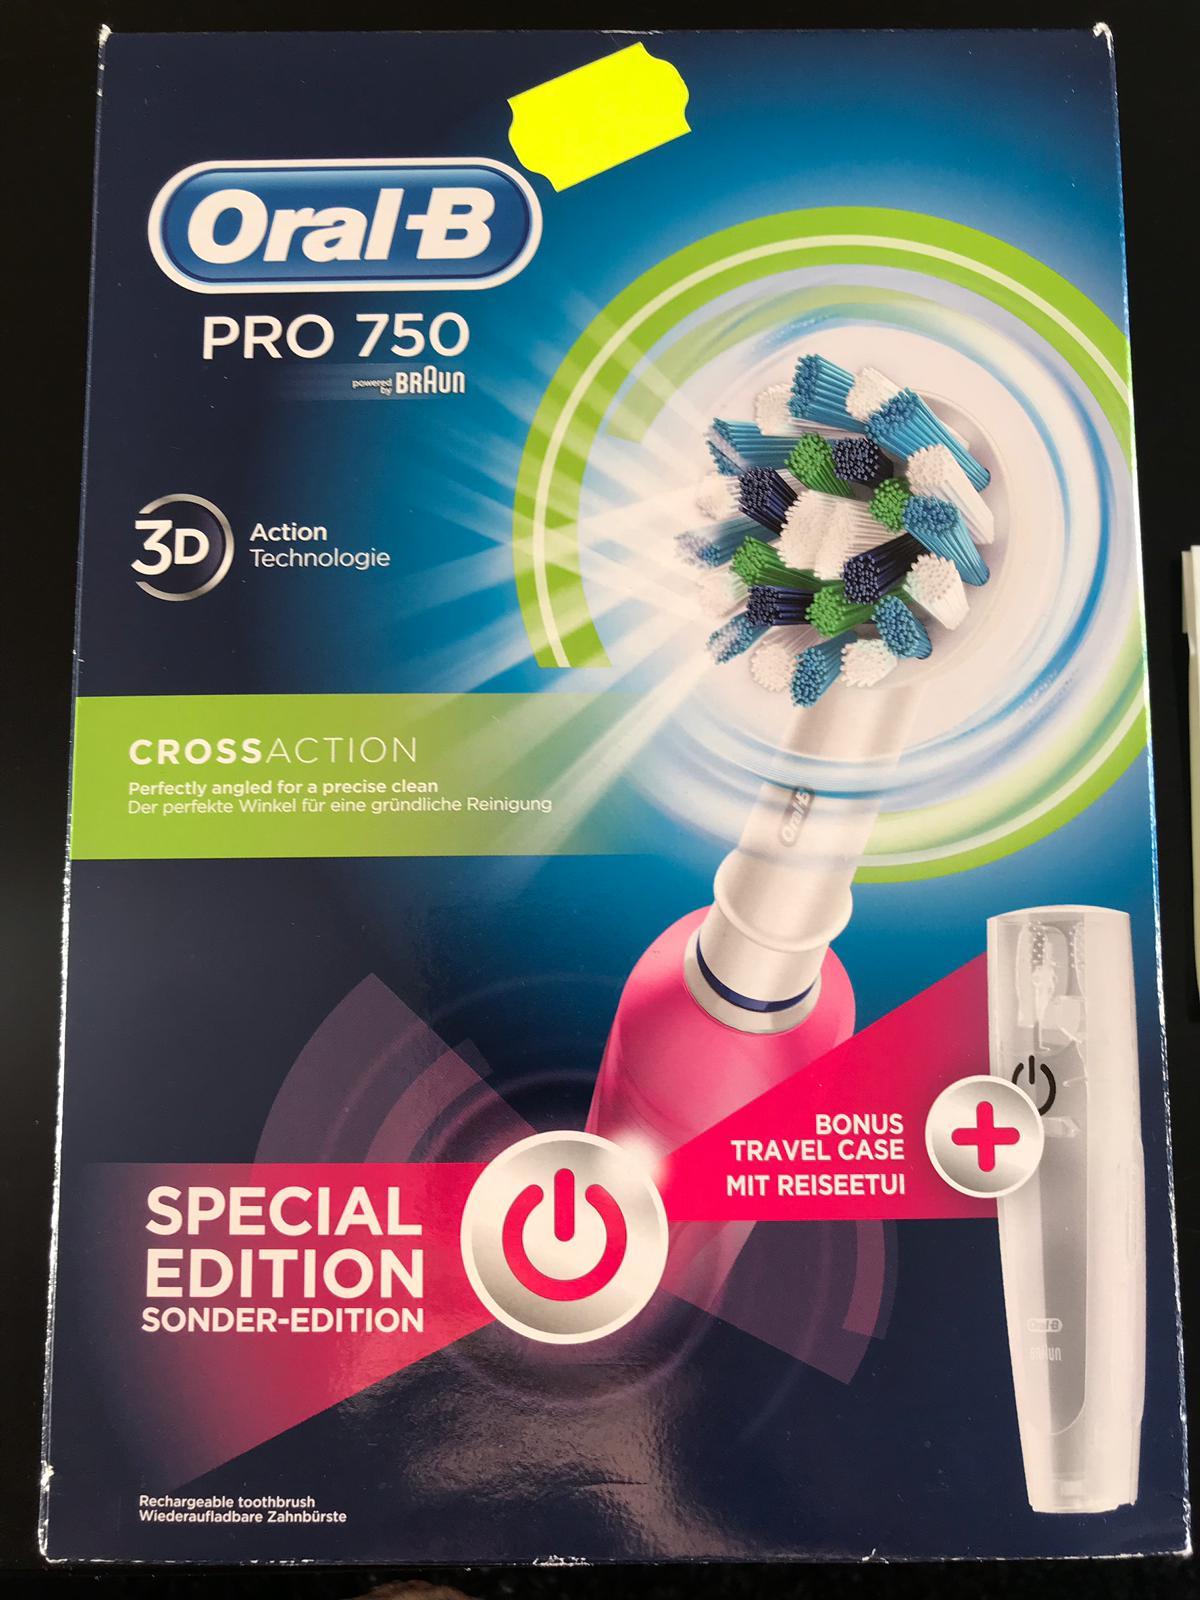 Oral-B PRO 750 voor maar €9 met Extravoordeelkaart @Kruidvat